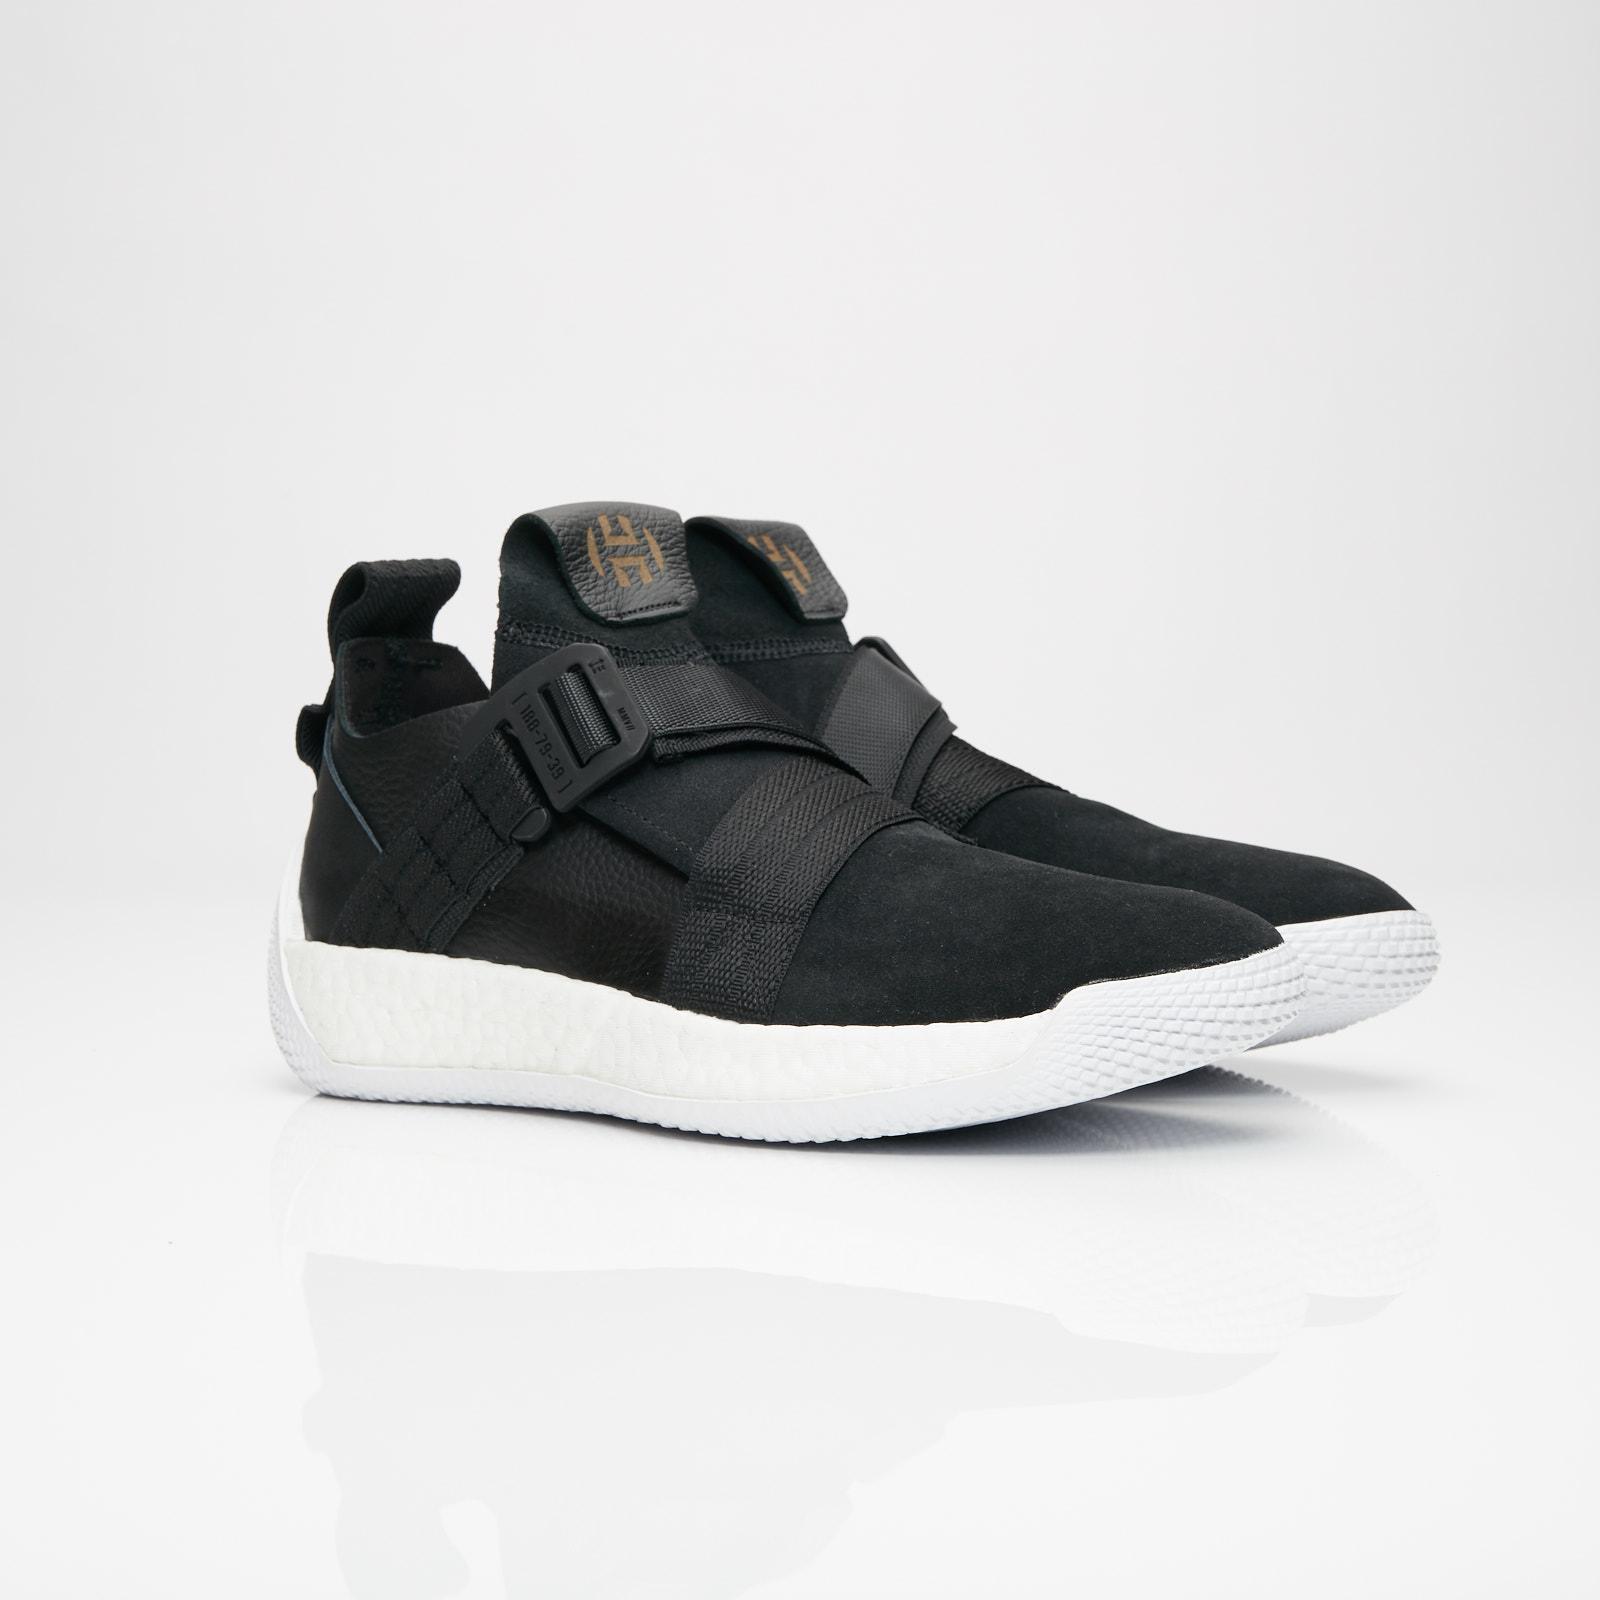 1991d211ab1 adidas Harden LS 2 Buckle - Ac7435 - Sneakersnstuff